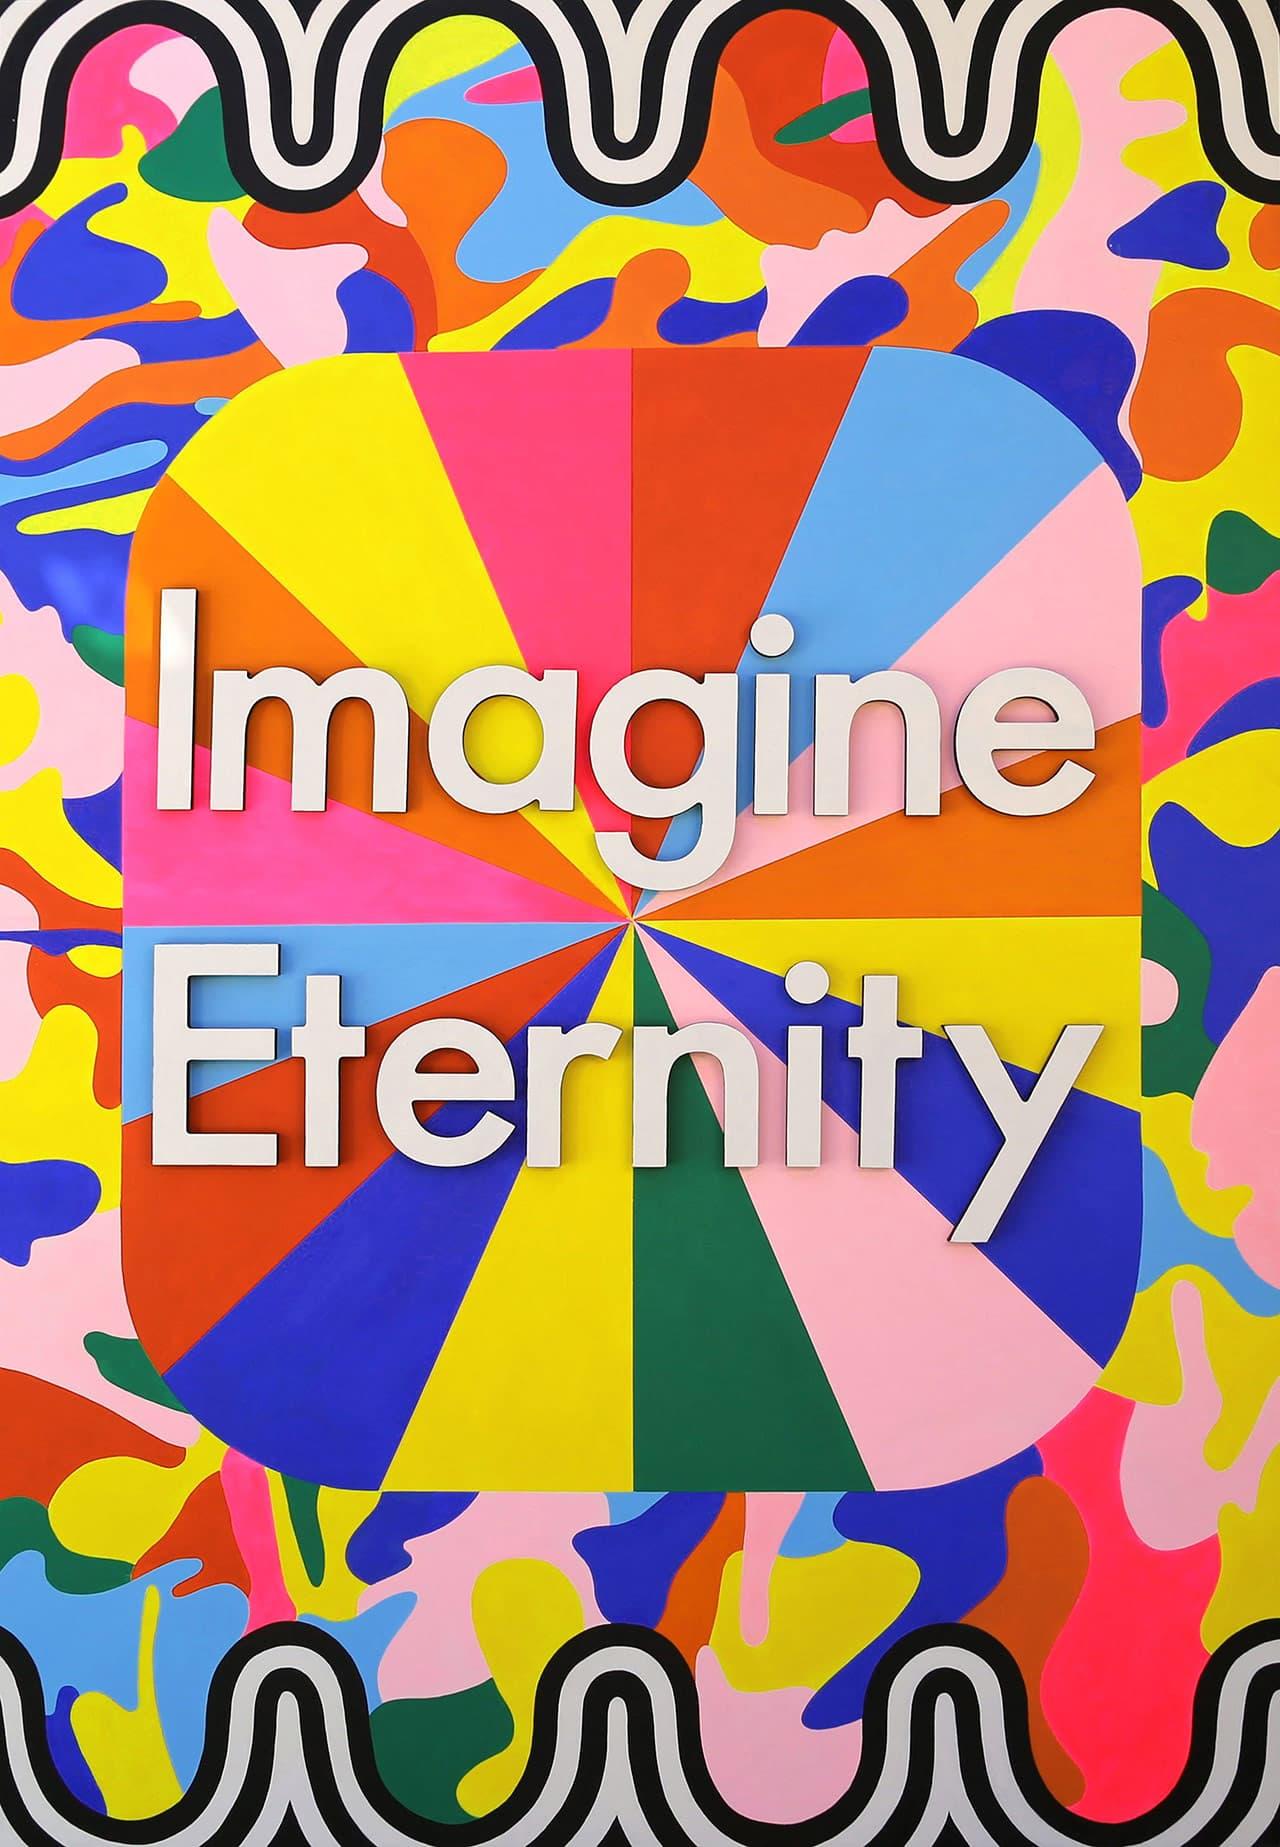 Imagine eternity, 2015